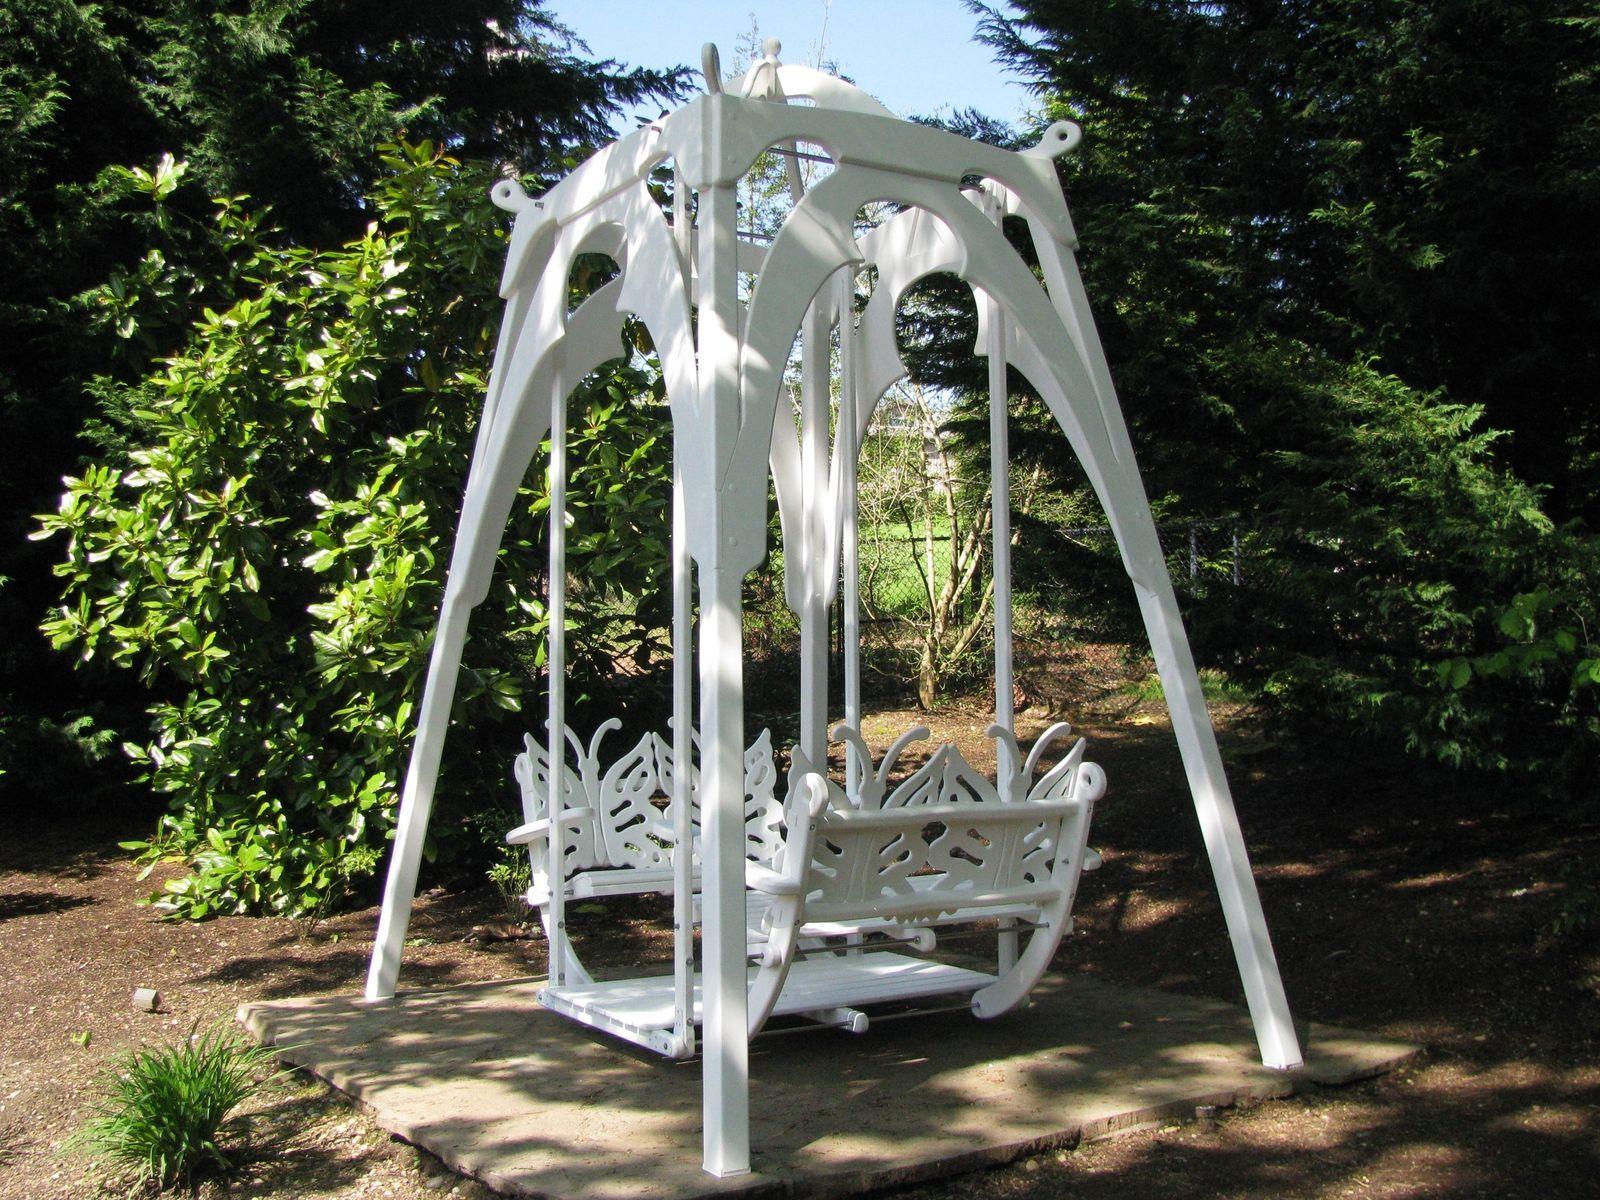 a modern day twist on the garden glider swing description from